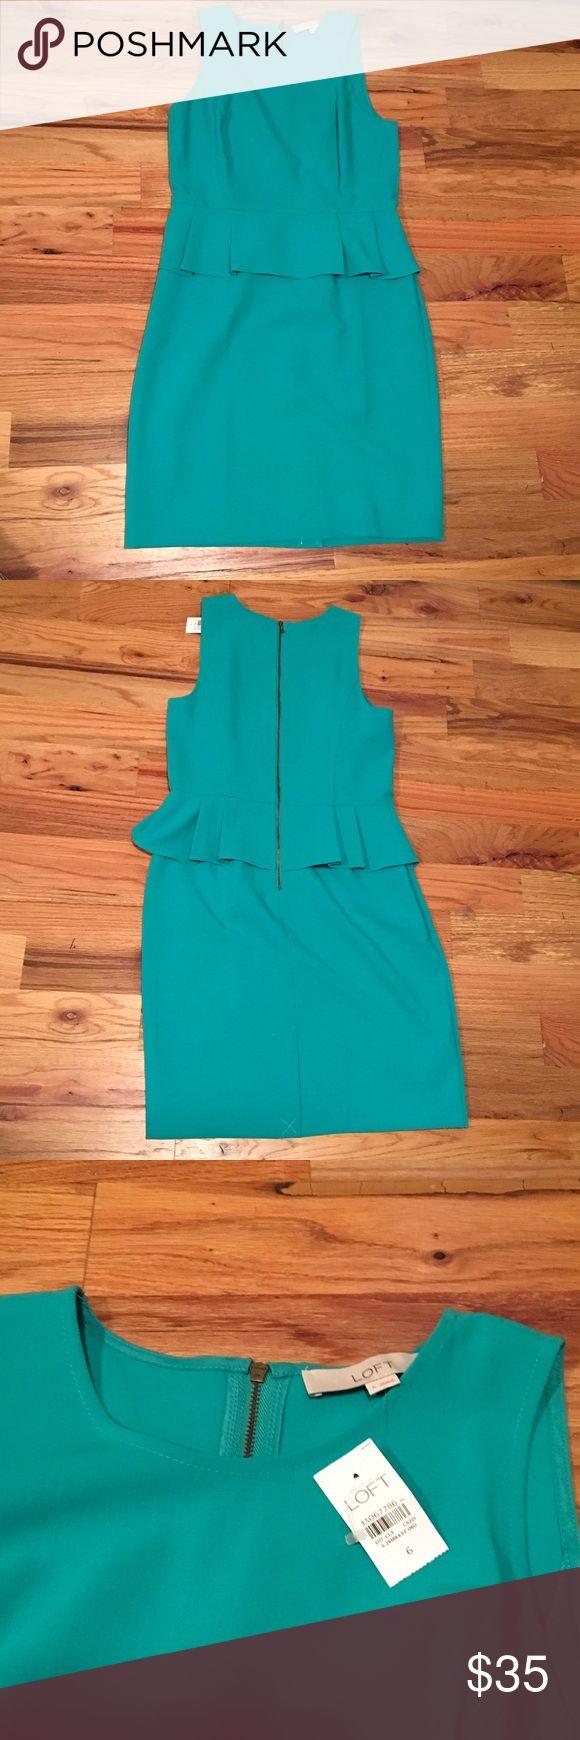 Ann Taylor Loft Dress NWT Loft teal dress. Great for work or as a summer wedding guest. LOFT Dresses